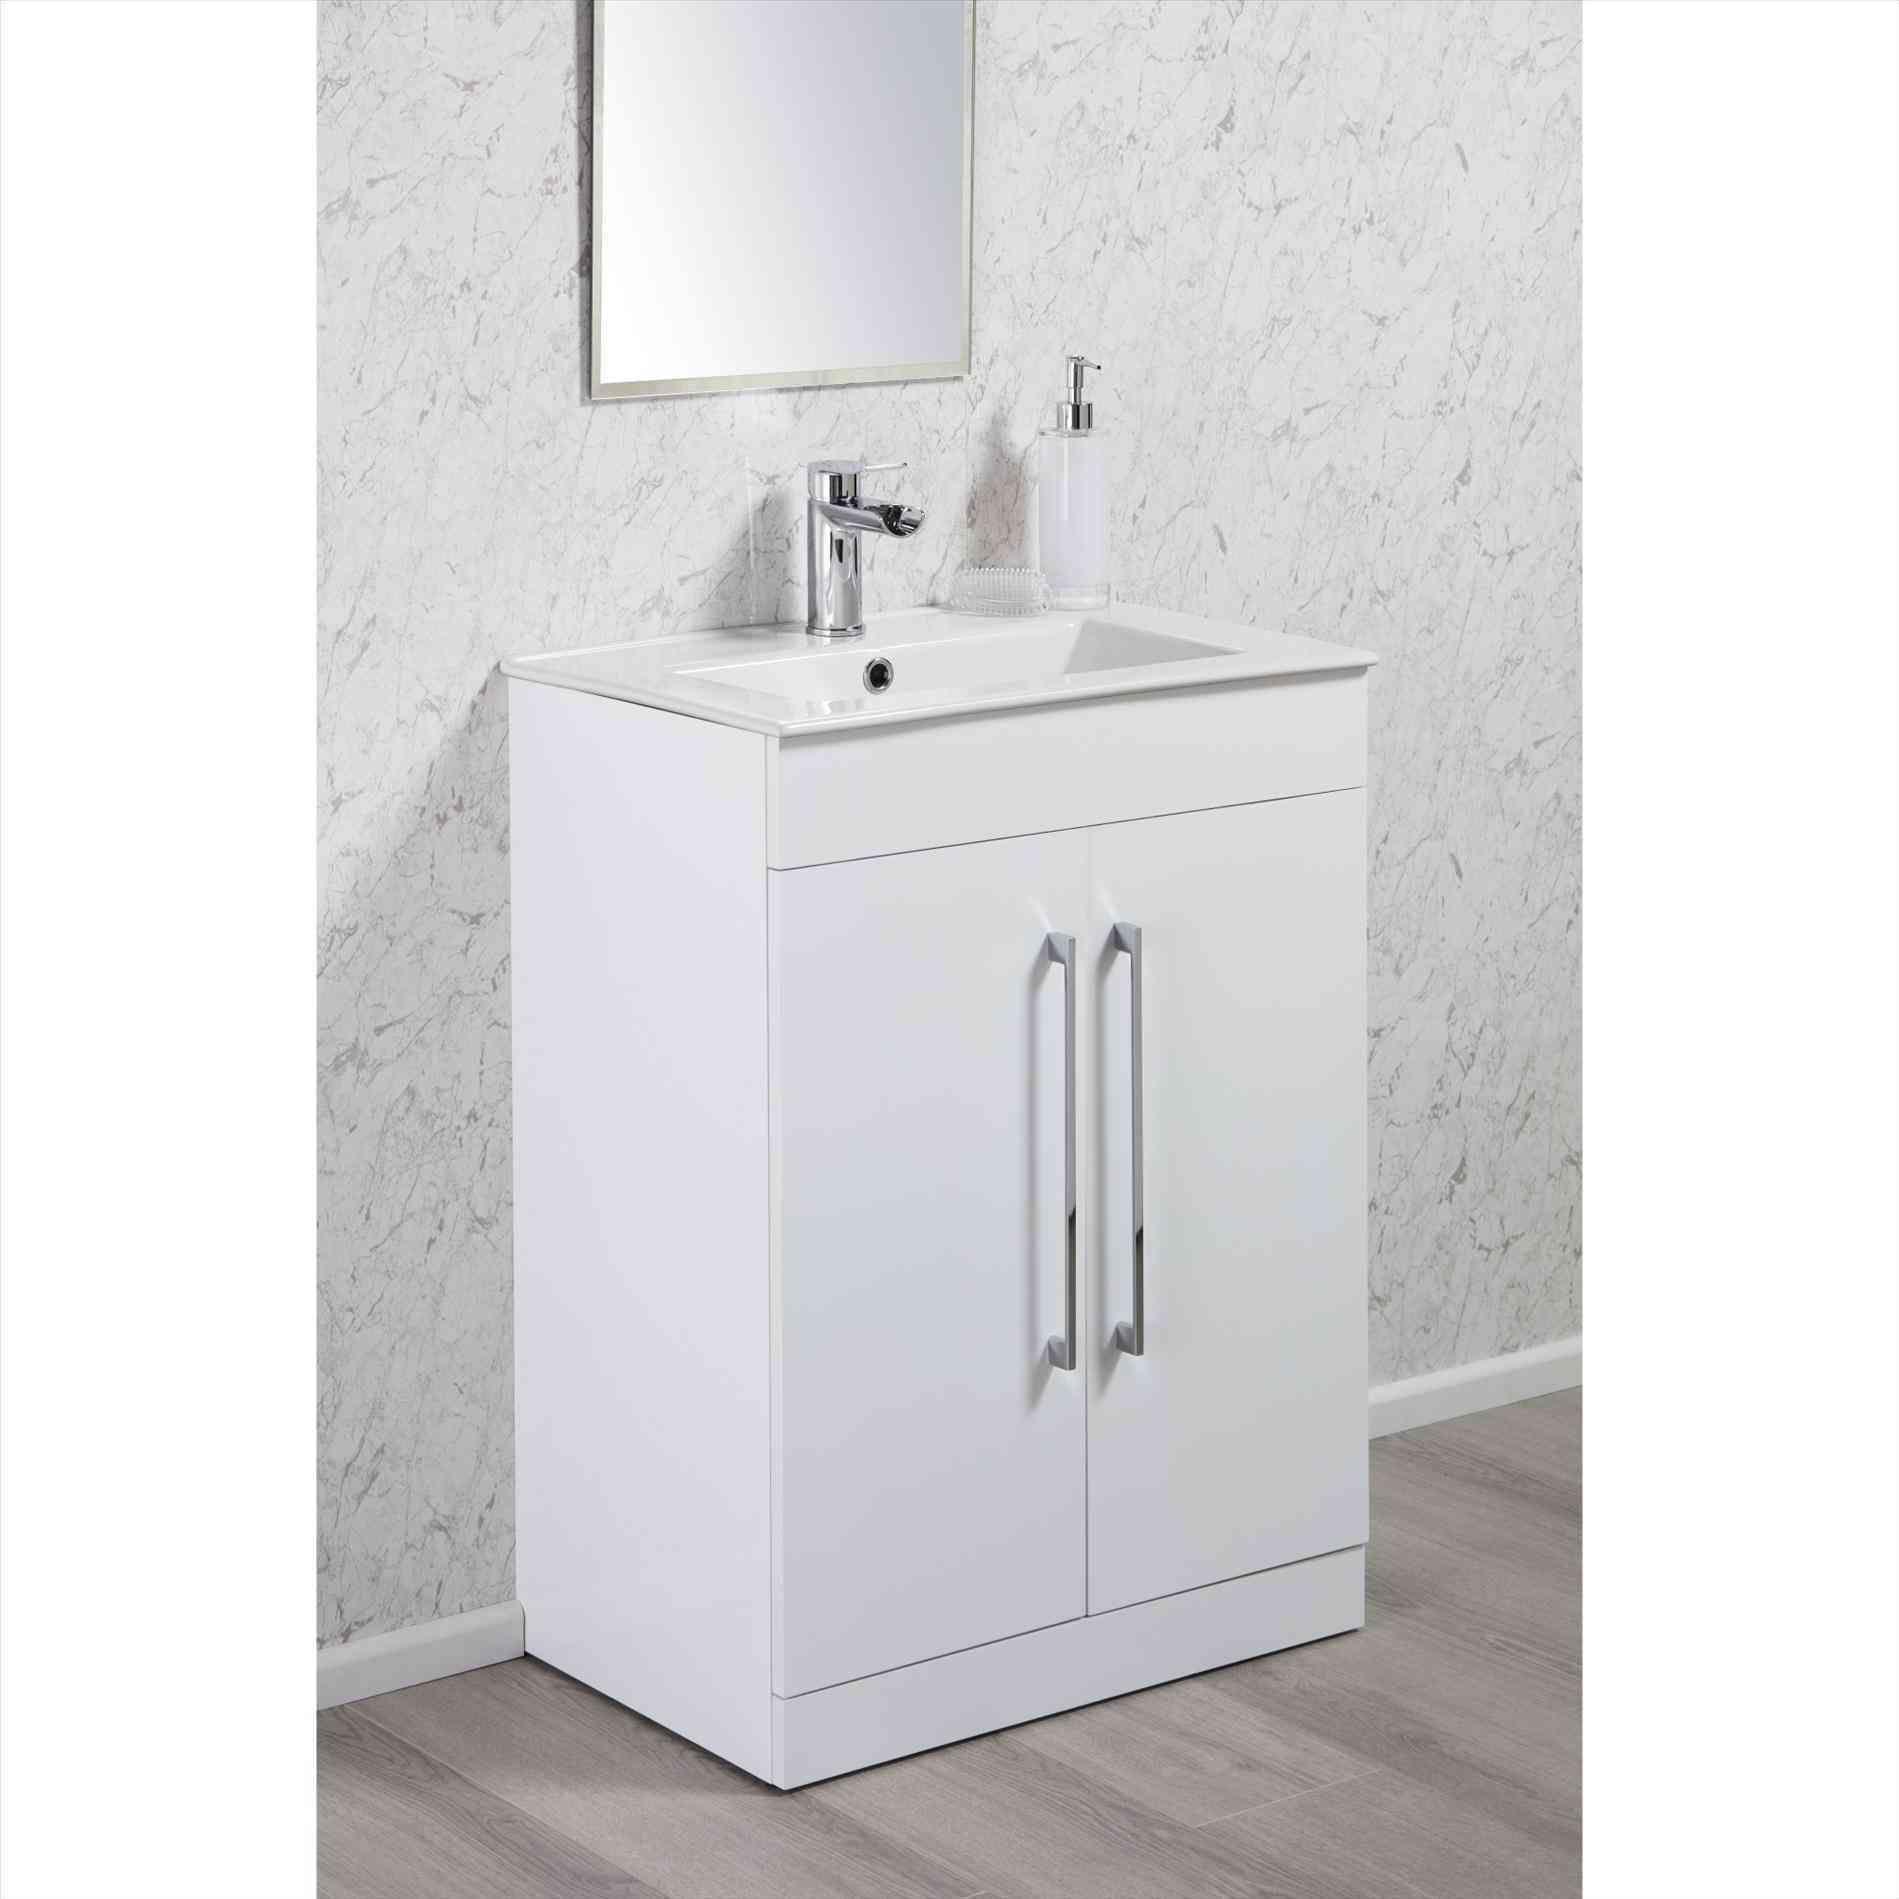 New Post Clearance Bathroom Sets